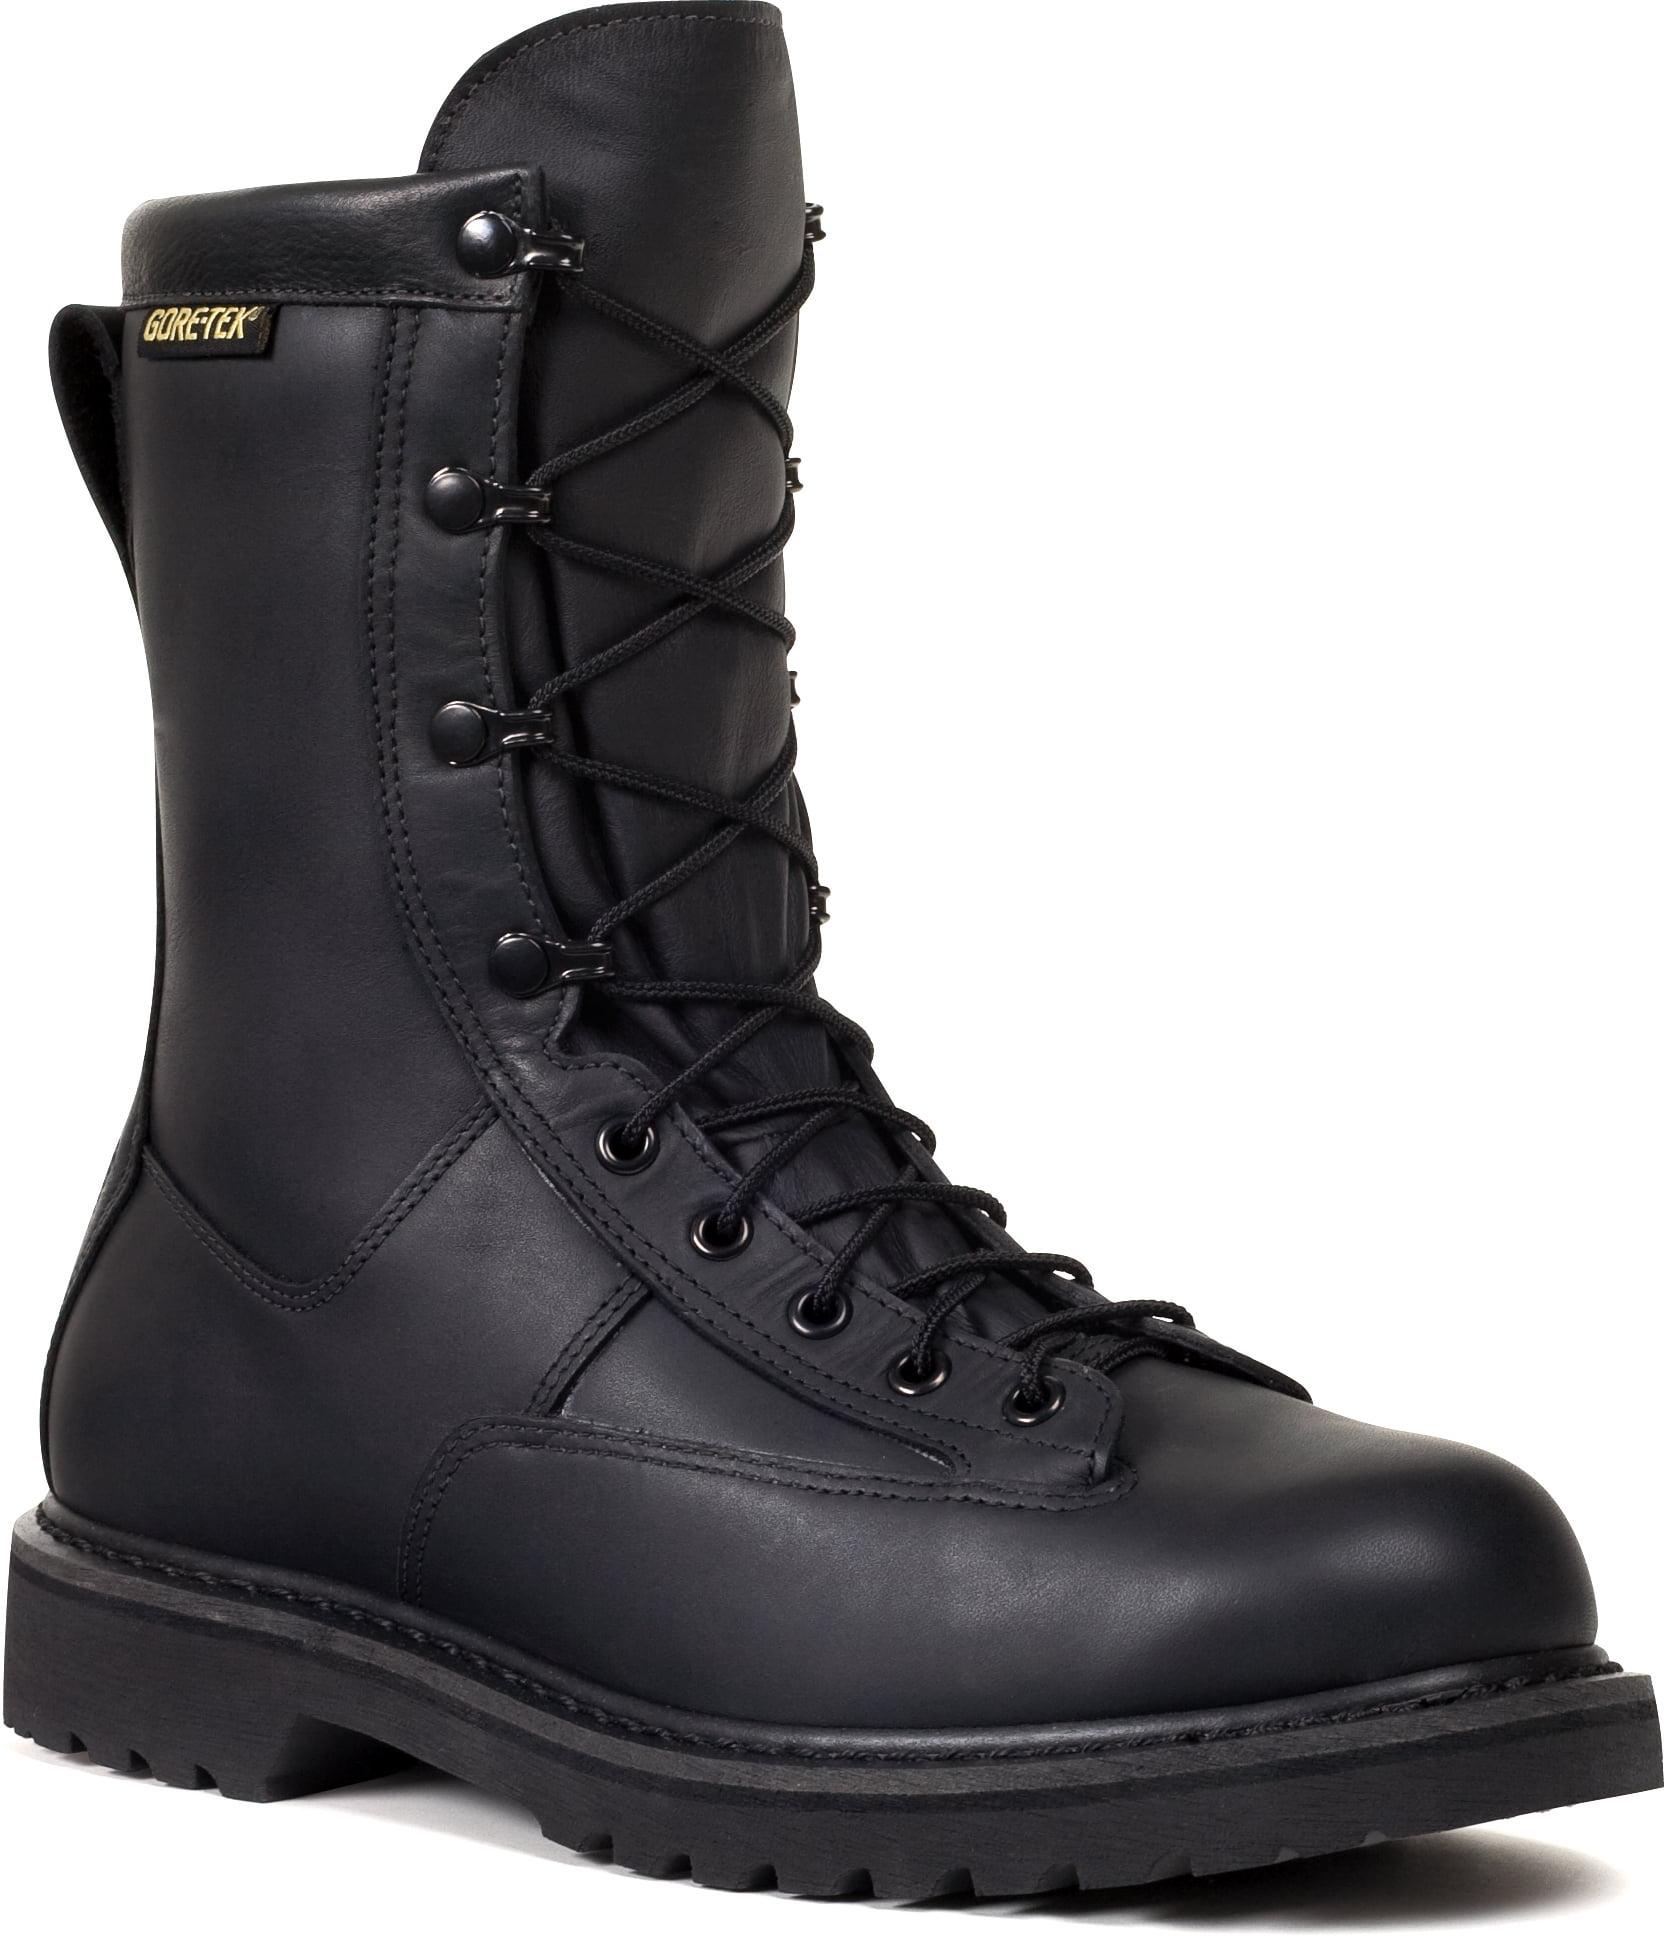 Boots Black Leather 3.5 EW - Walmart